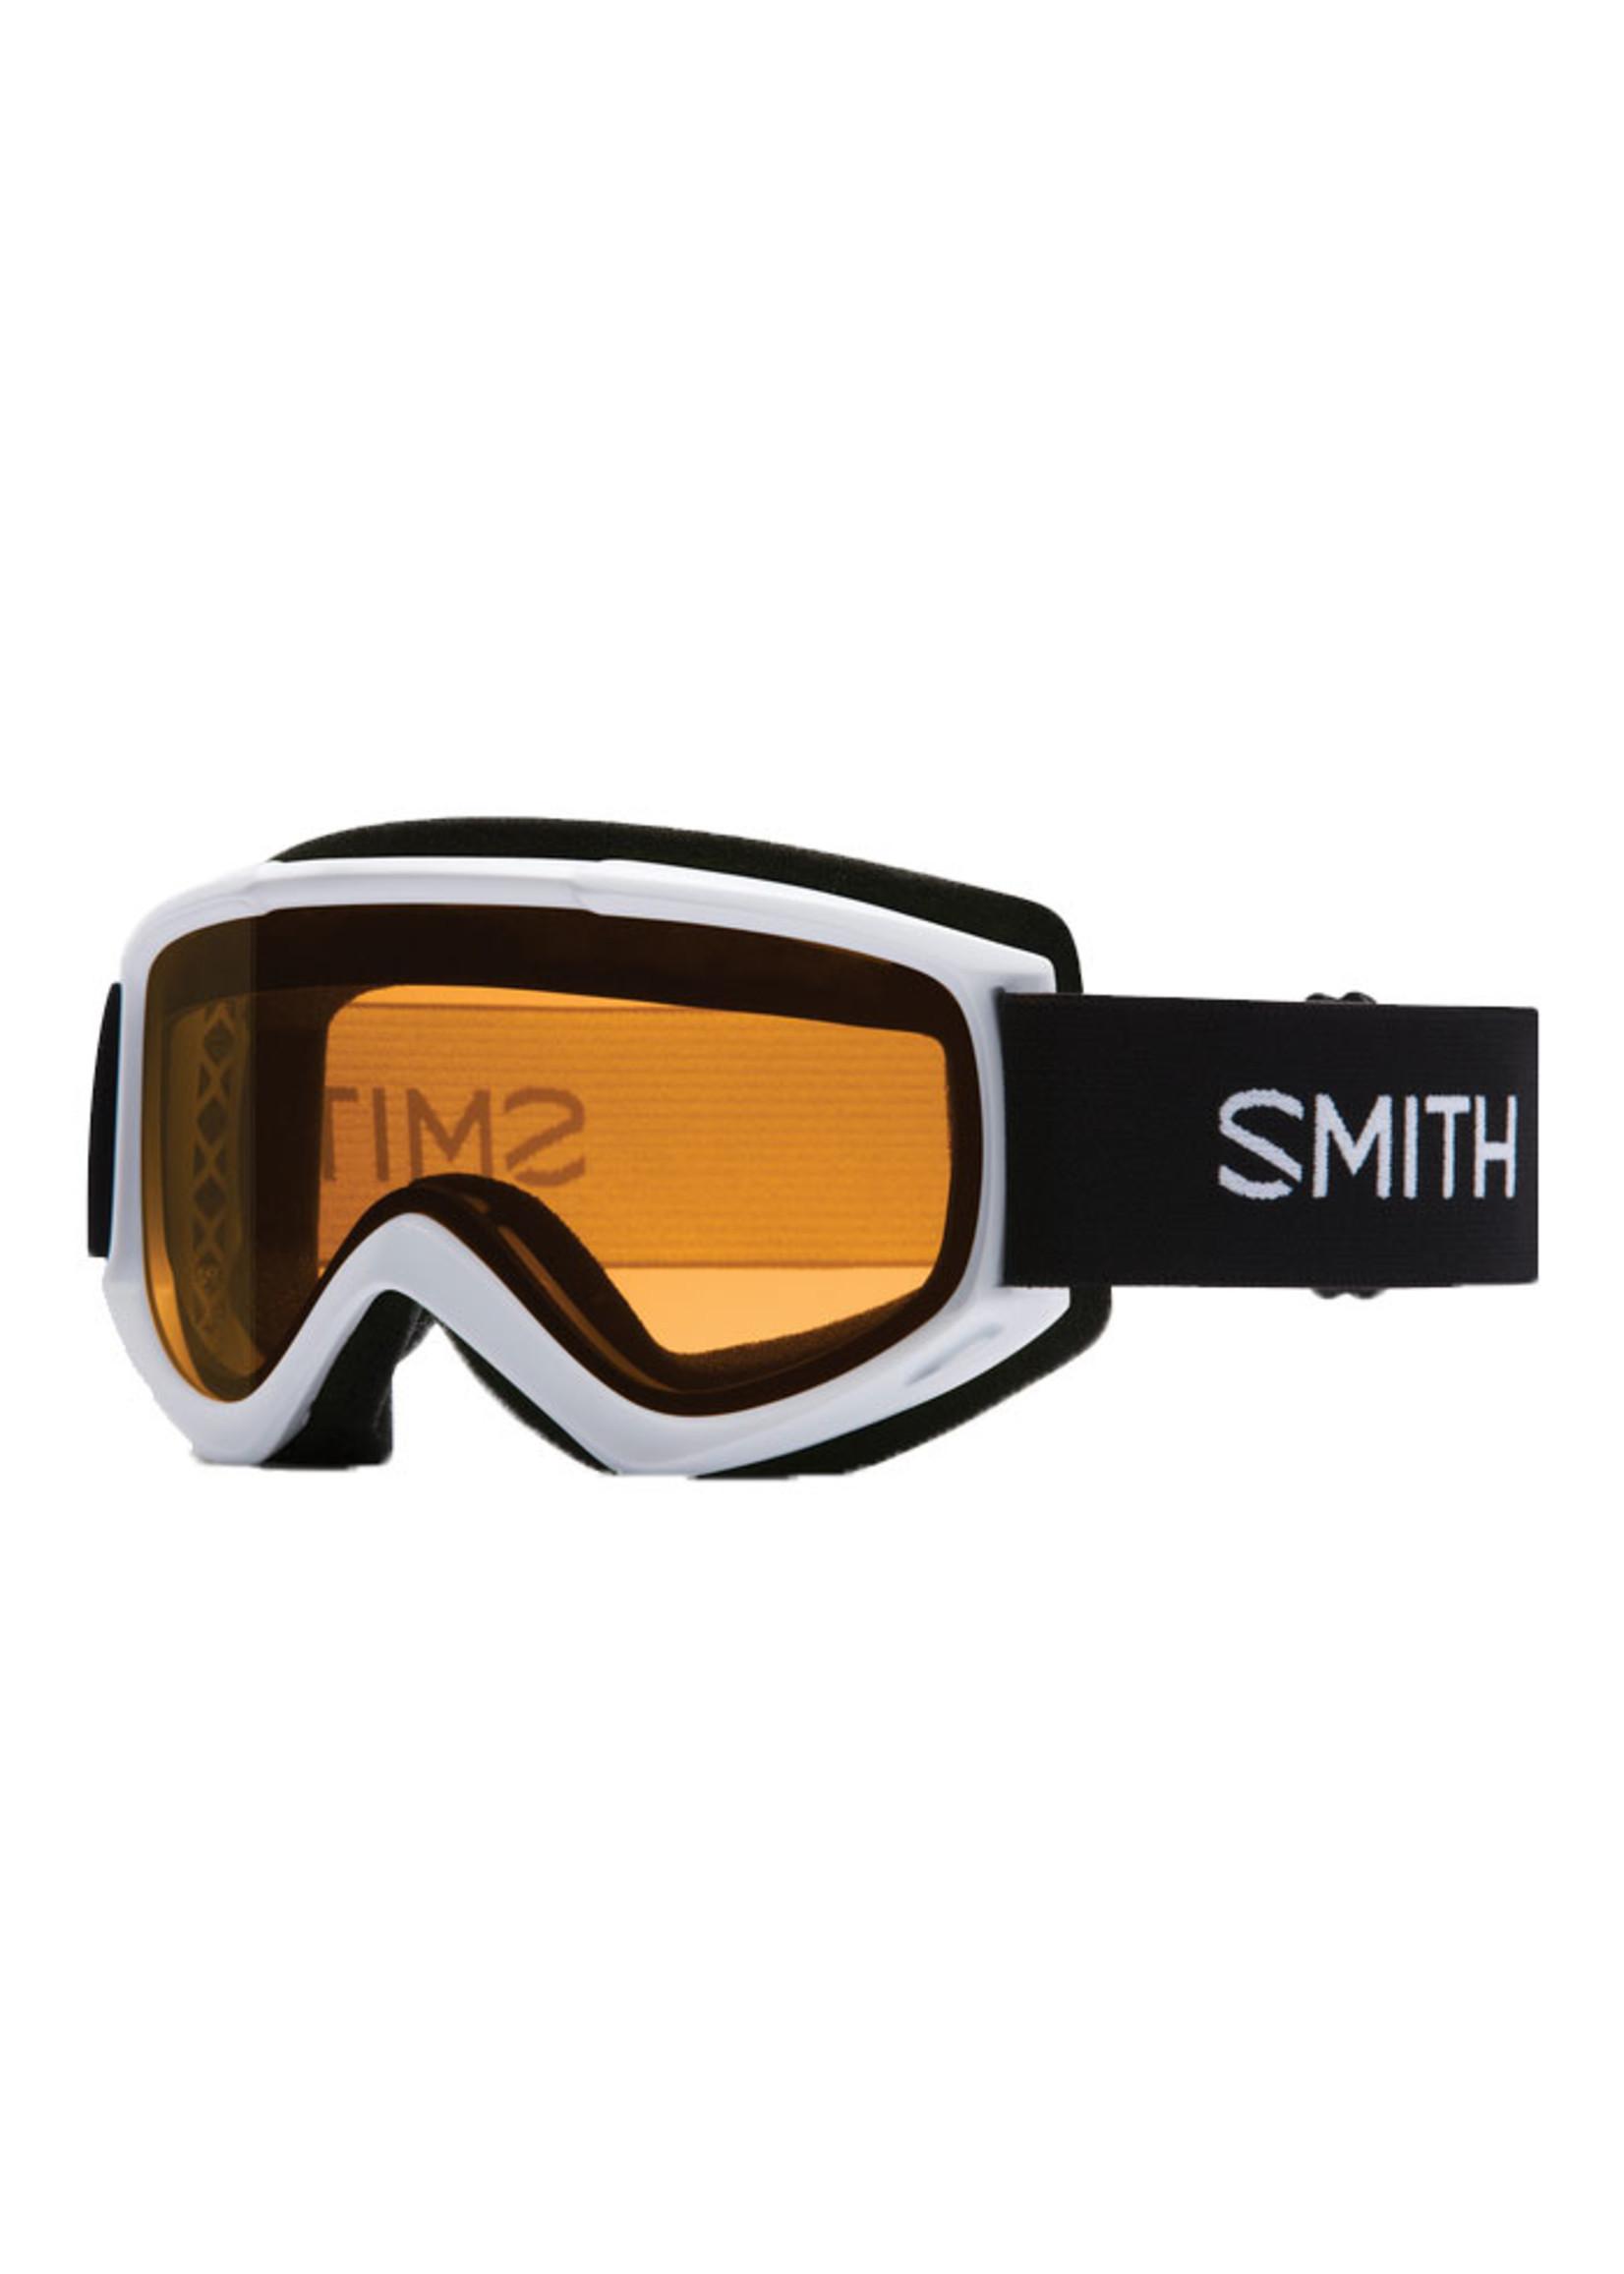 Smith Optics SMITH CASCADE CLASSIC LUNETTE